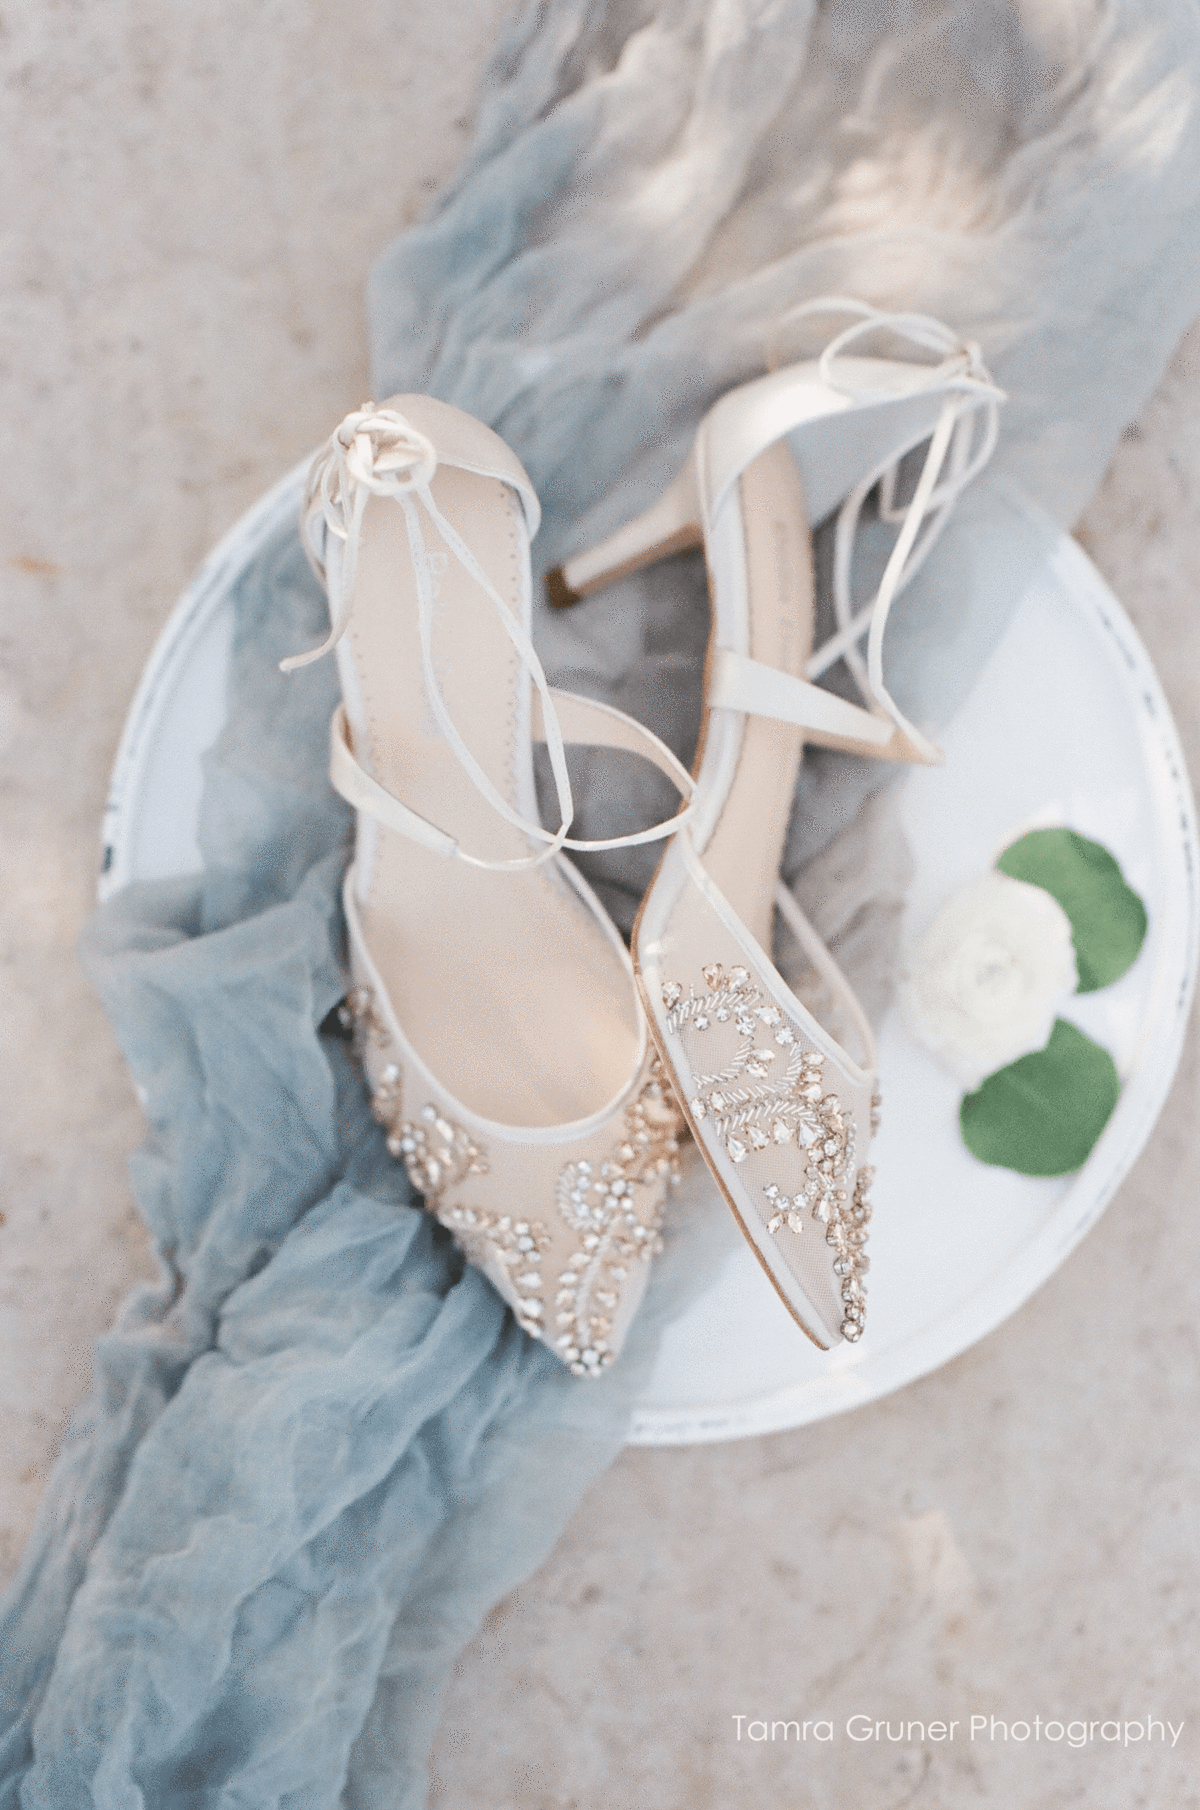 21b8d59d0a21 Crystal embellished ivory wedding shoes low heel kitten heels with milky  teardrop stones